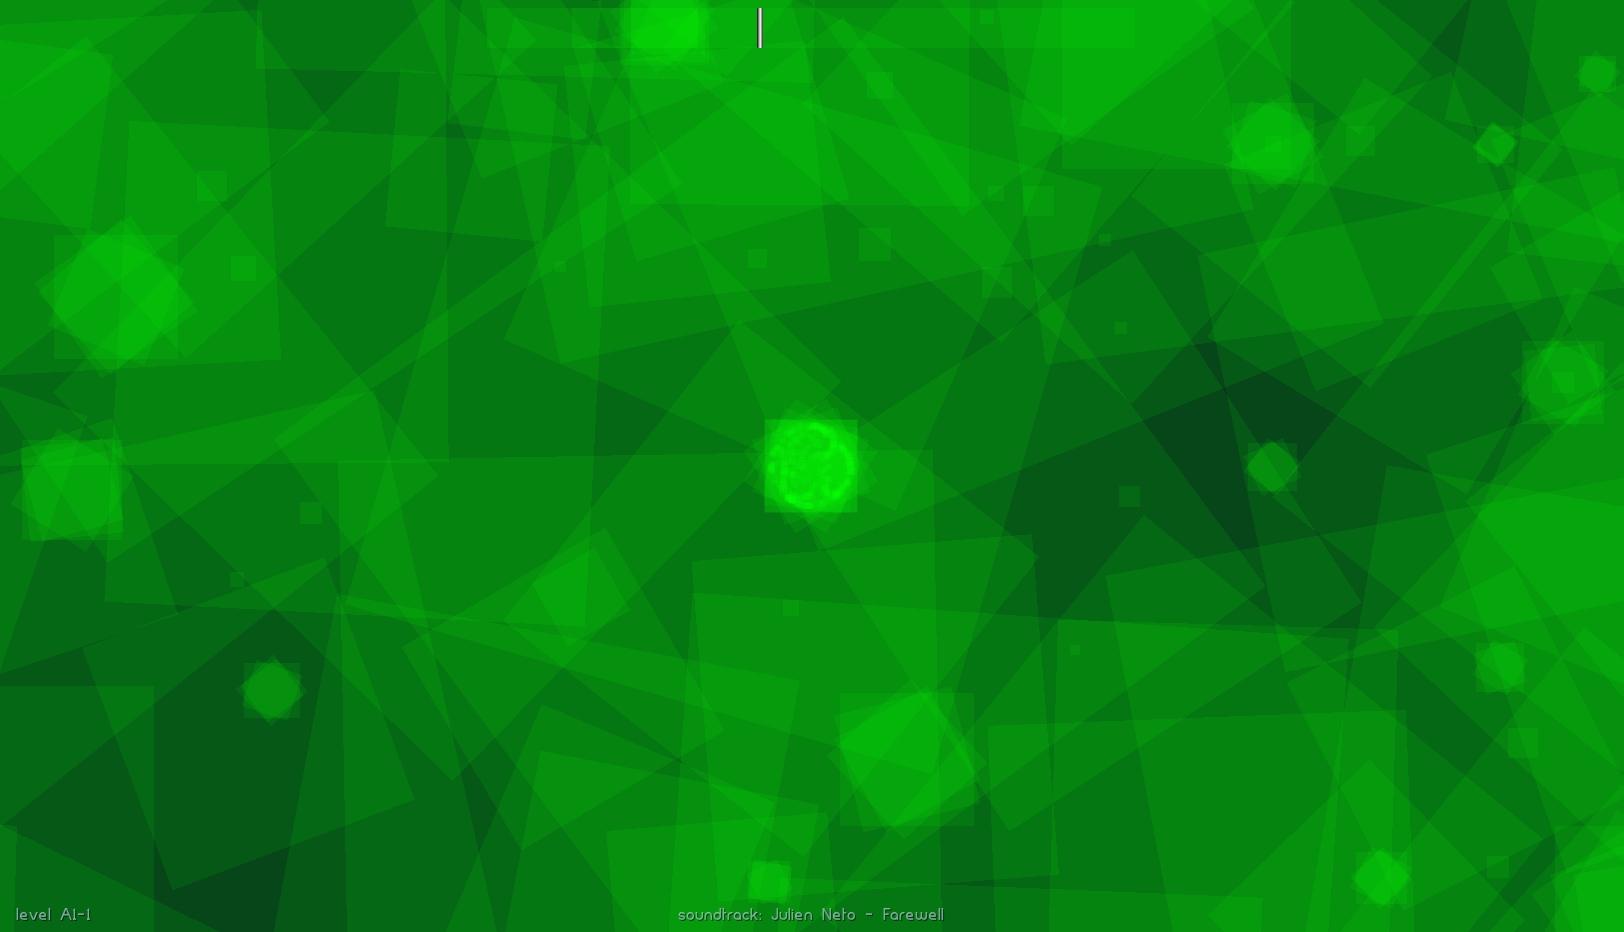 Debug view of overlapping stars